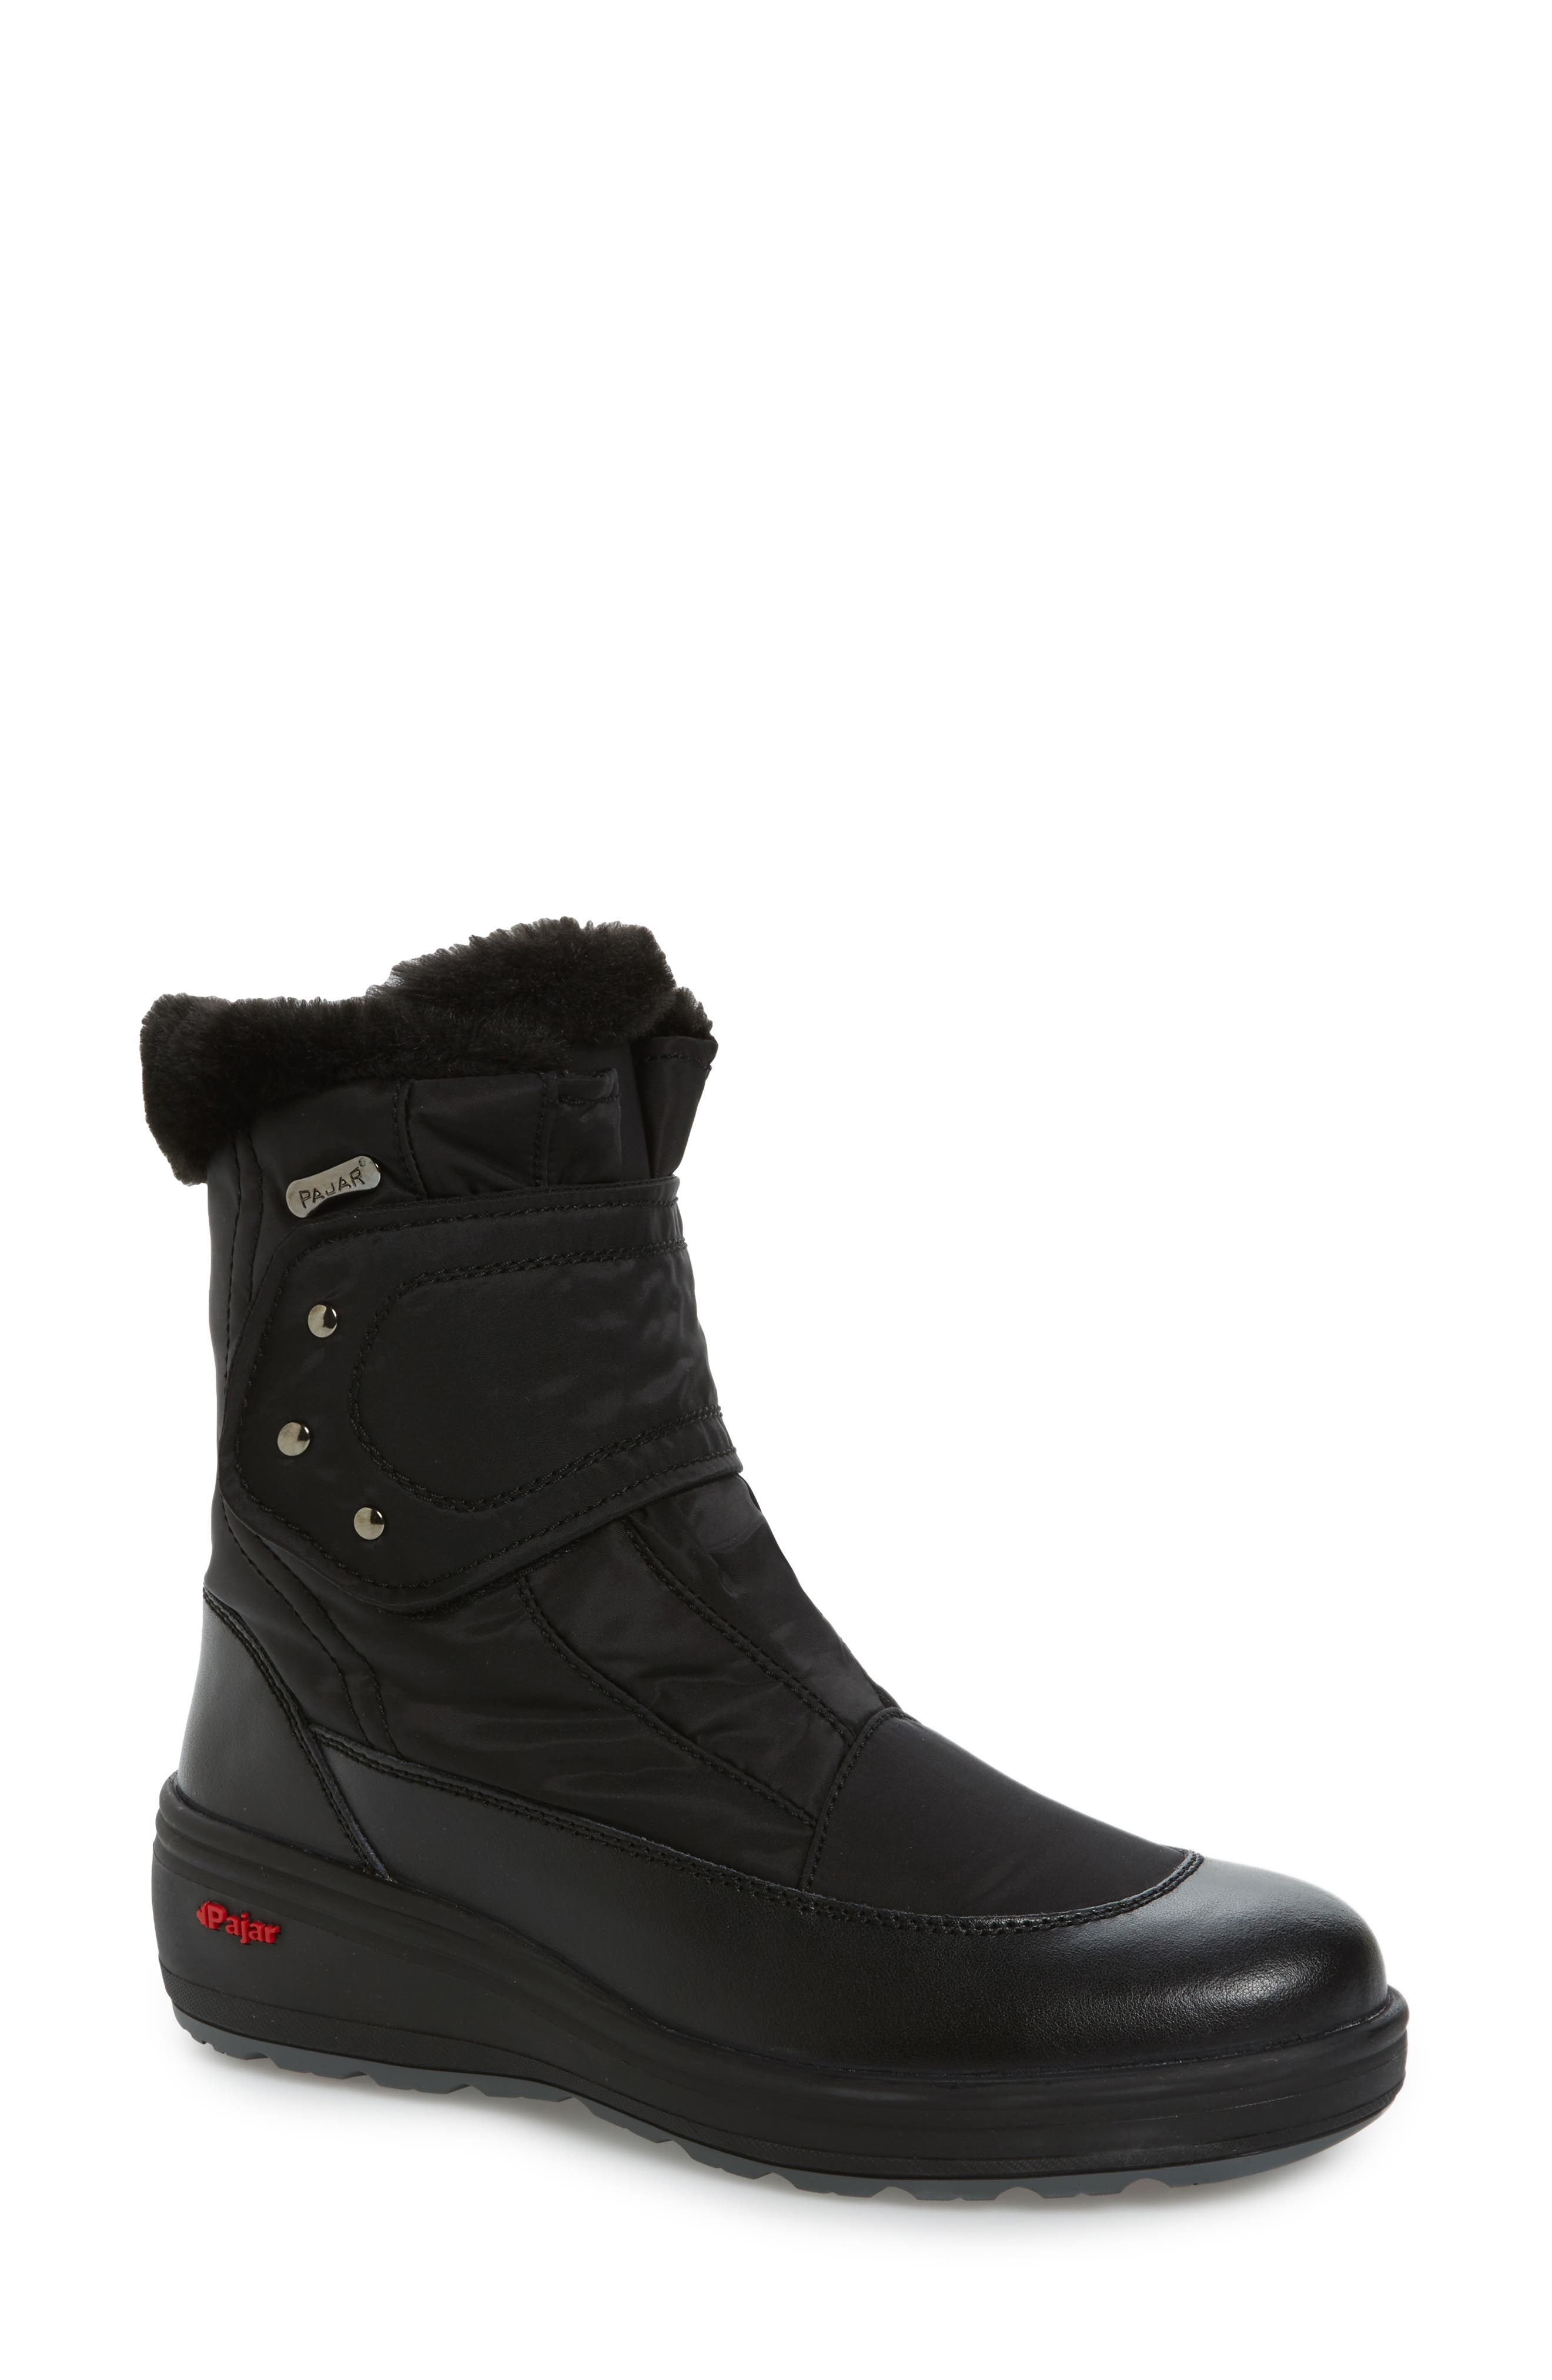 Pajar Samara Waterproof Insulated Boot with Faux Fur Lining (Women)